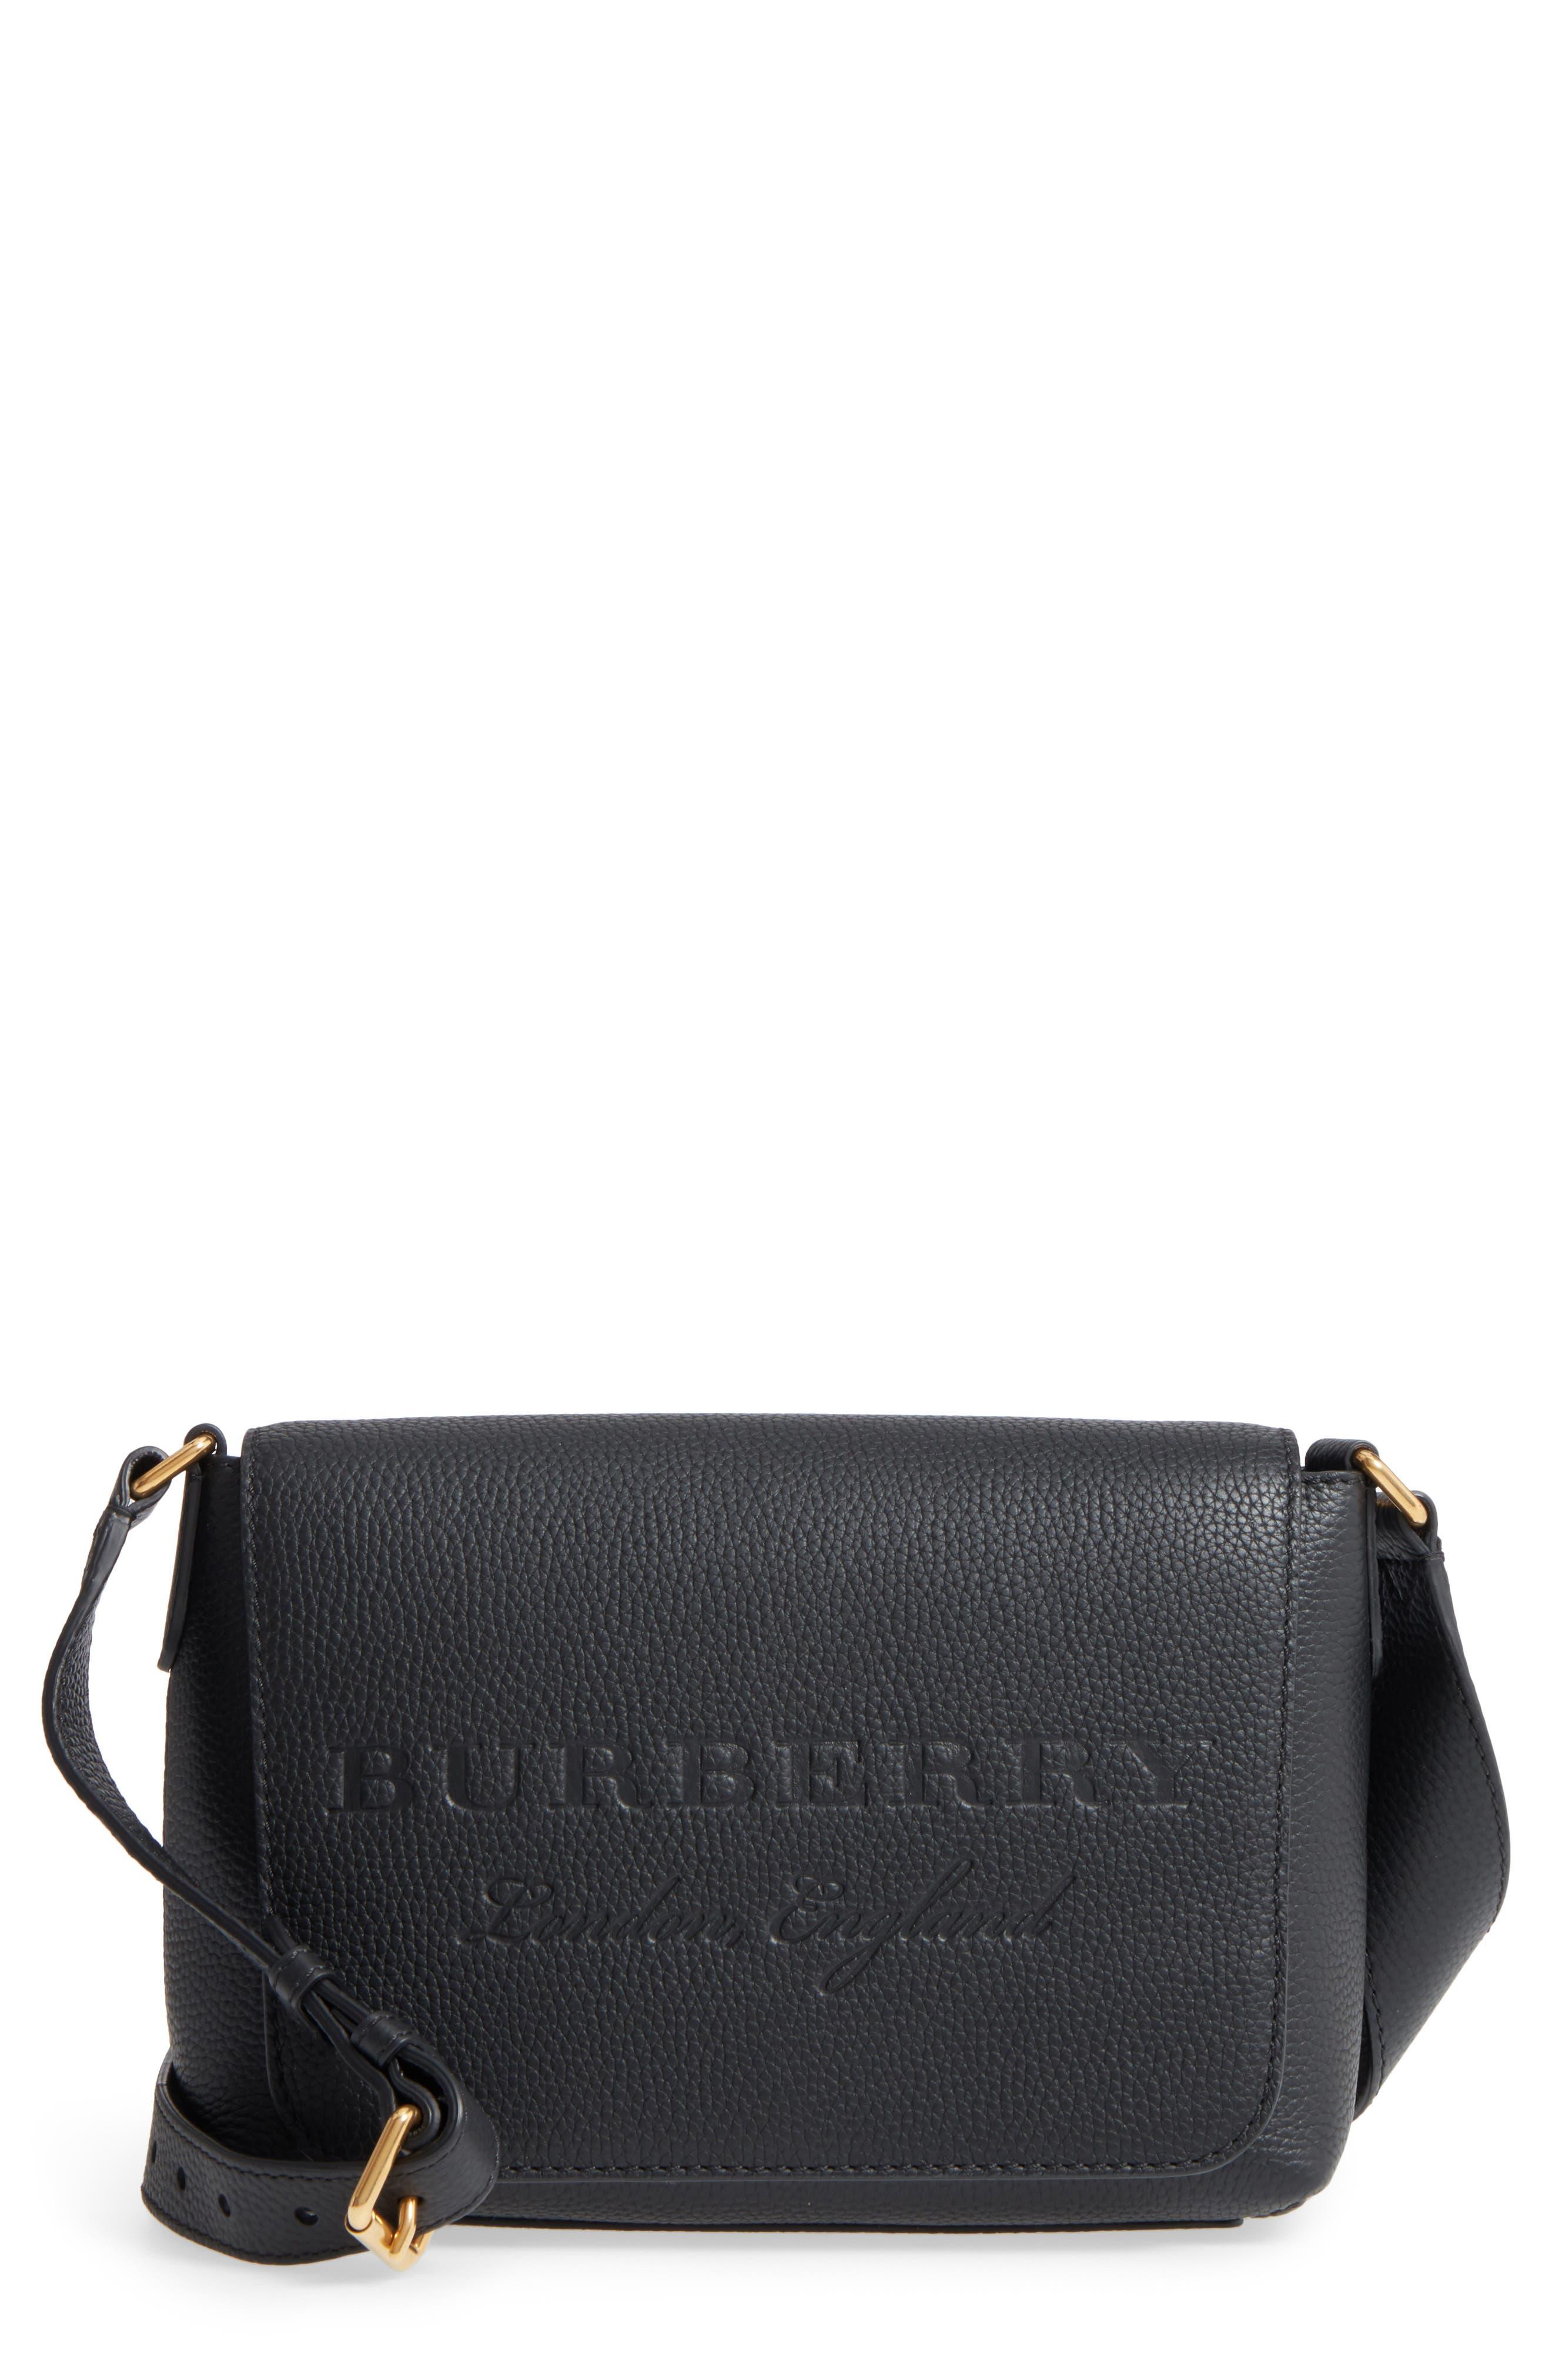 Main Image - Burberry Small Burleigh Leather Crossbody Bag